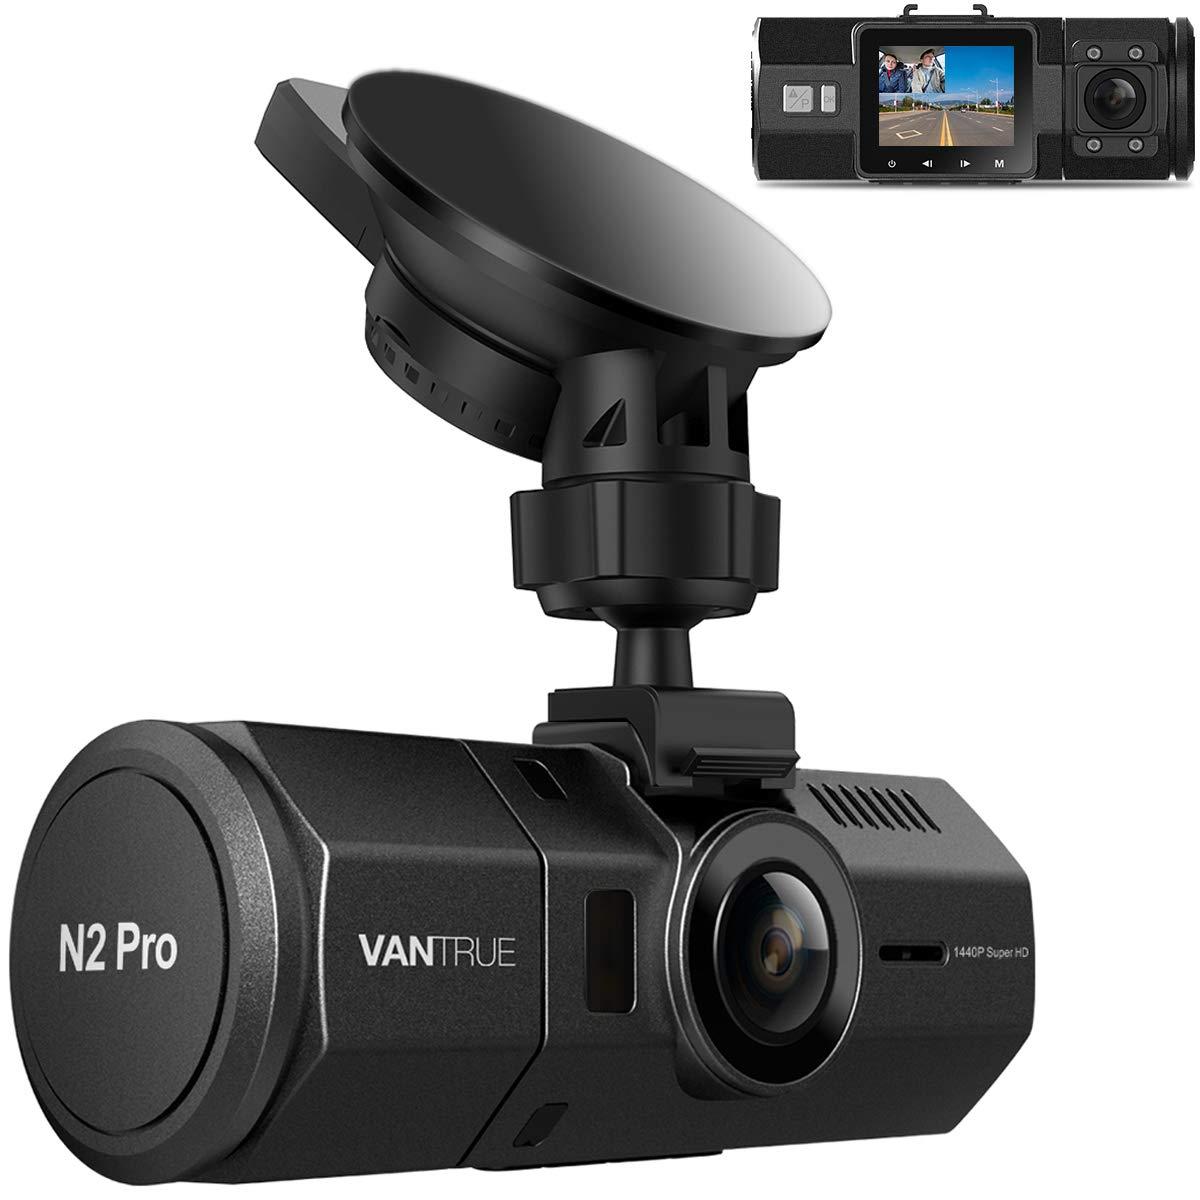 N2 Pro Infrared 1920x1080P 2560x1440P